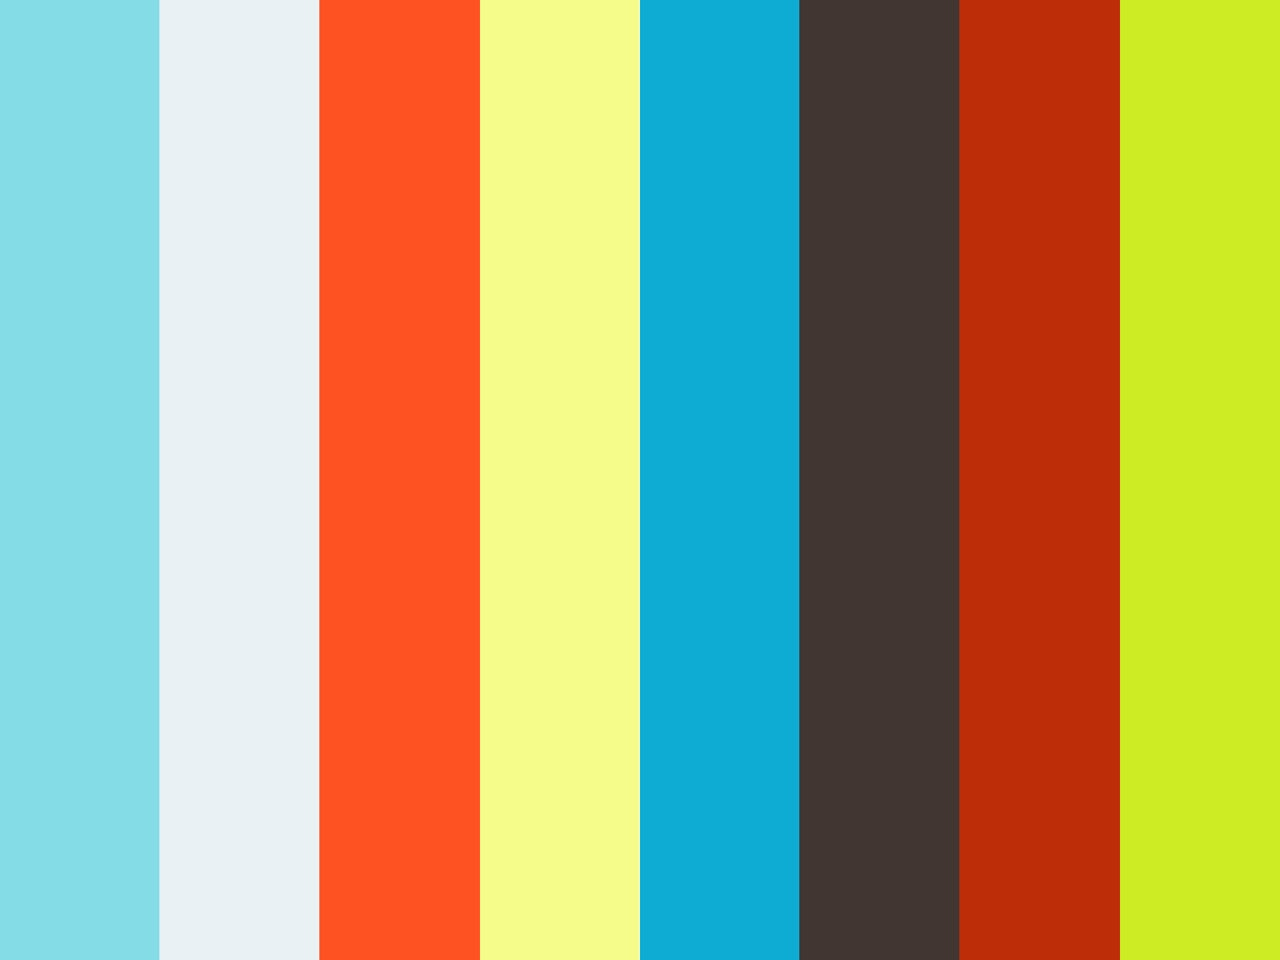 Molokai Covid19 Update - Tuesday, April 21, 2020